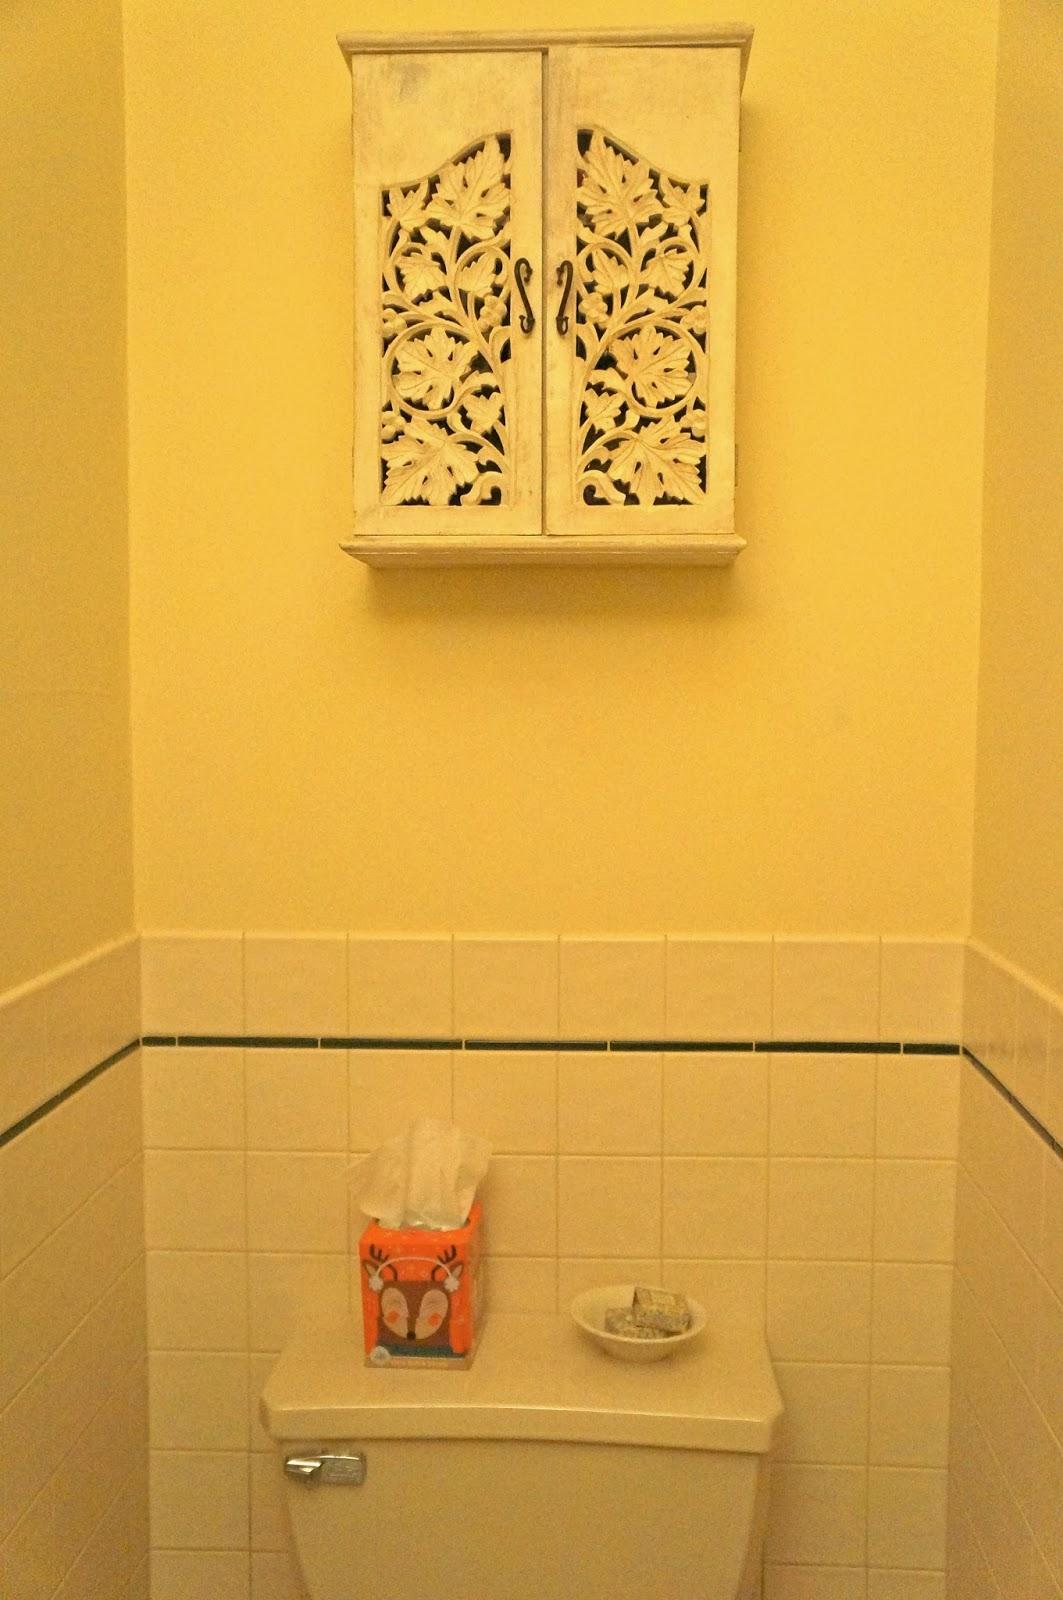 Hardly Housewives: Beadboard Ceilings for a Half-Bathroom